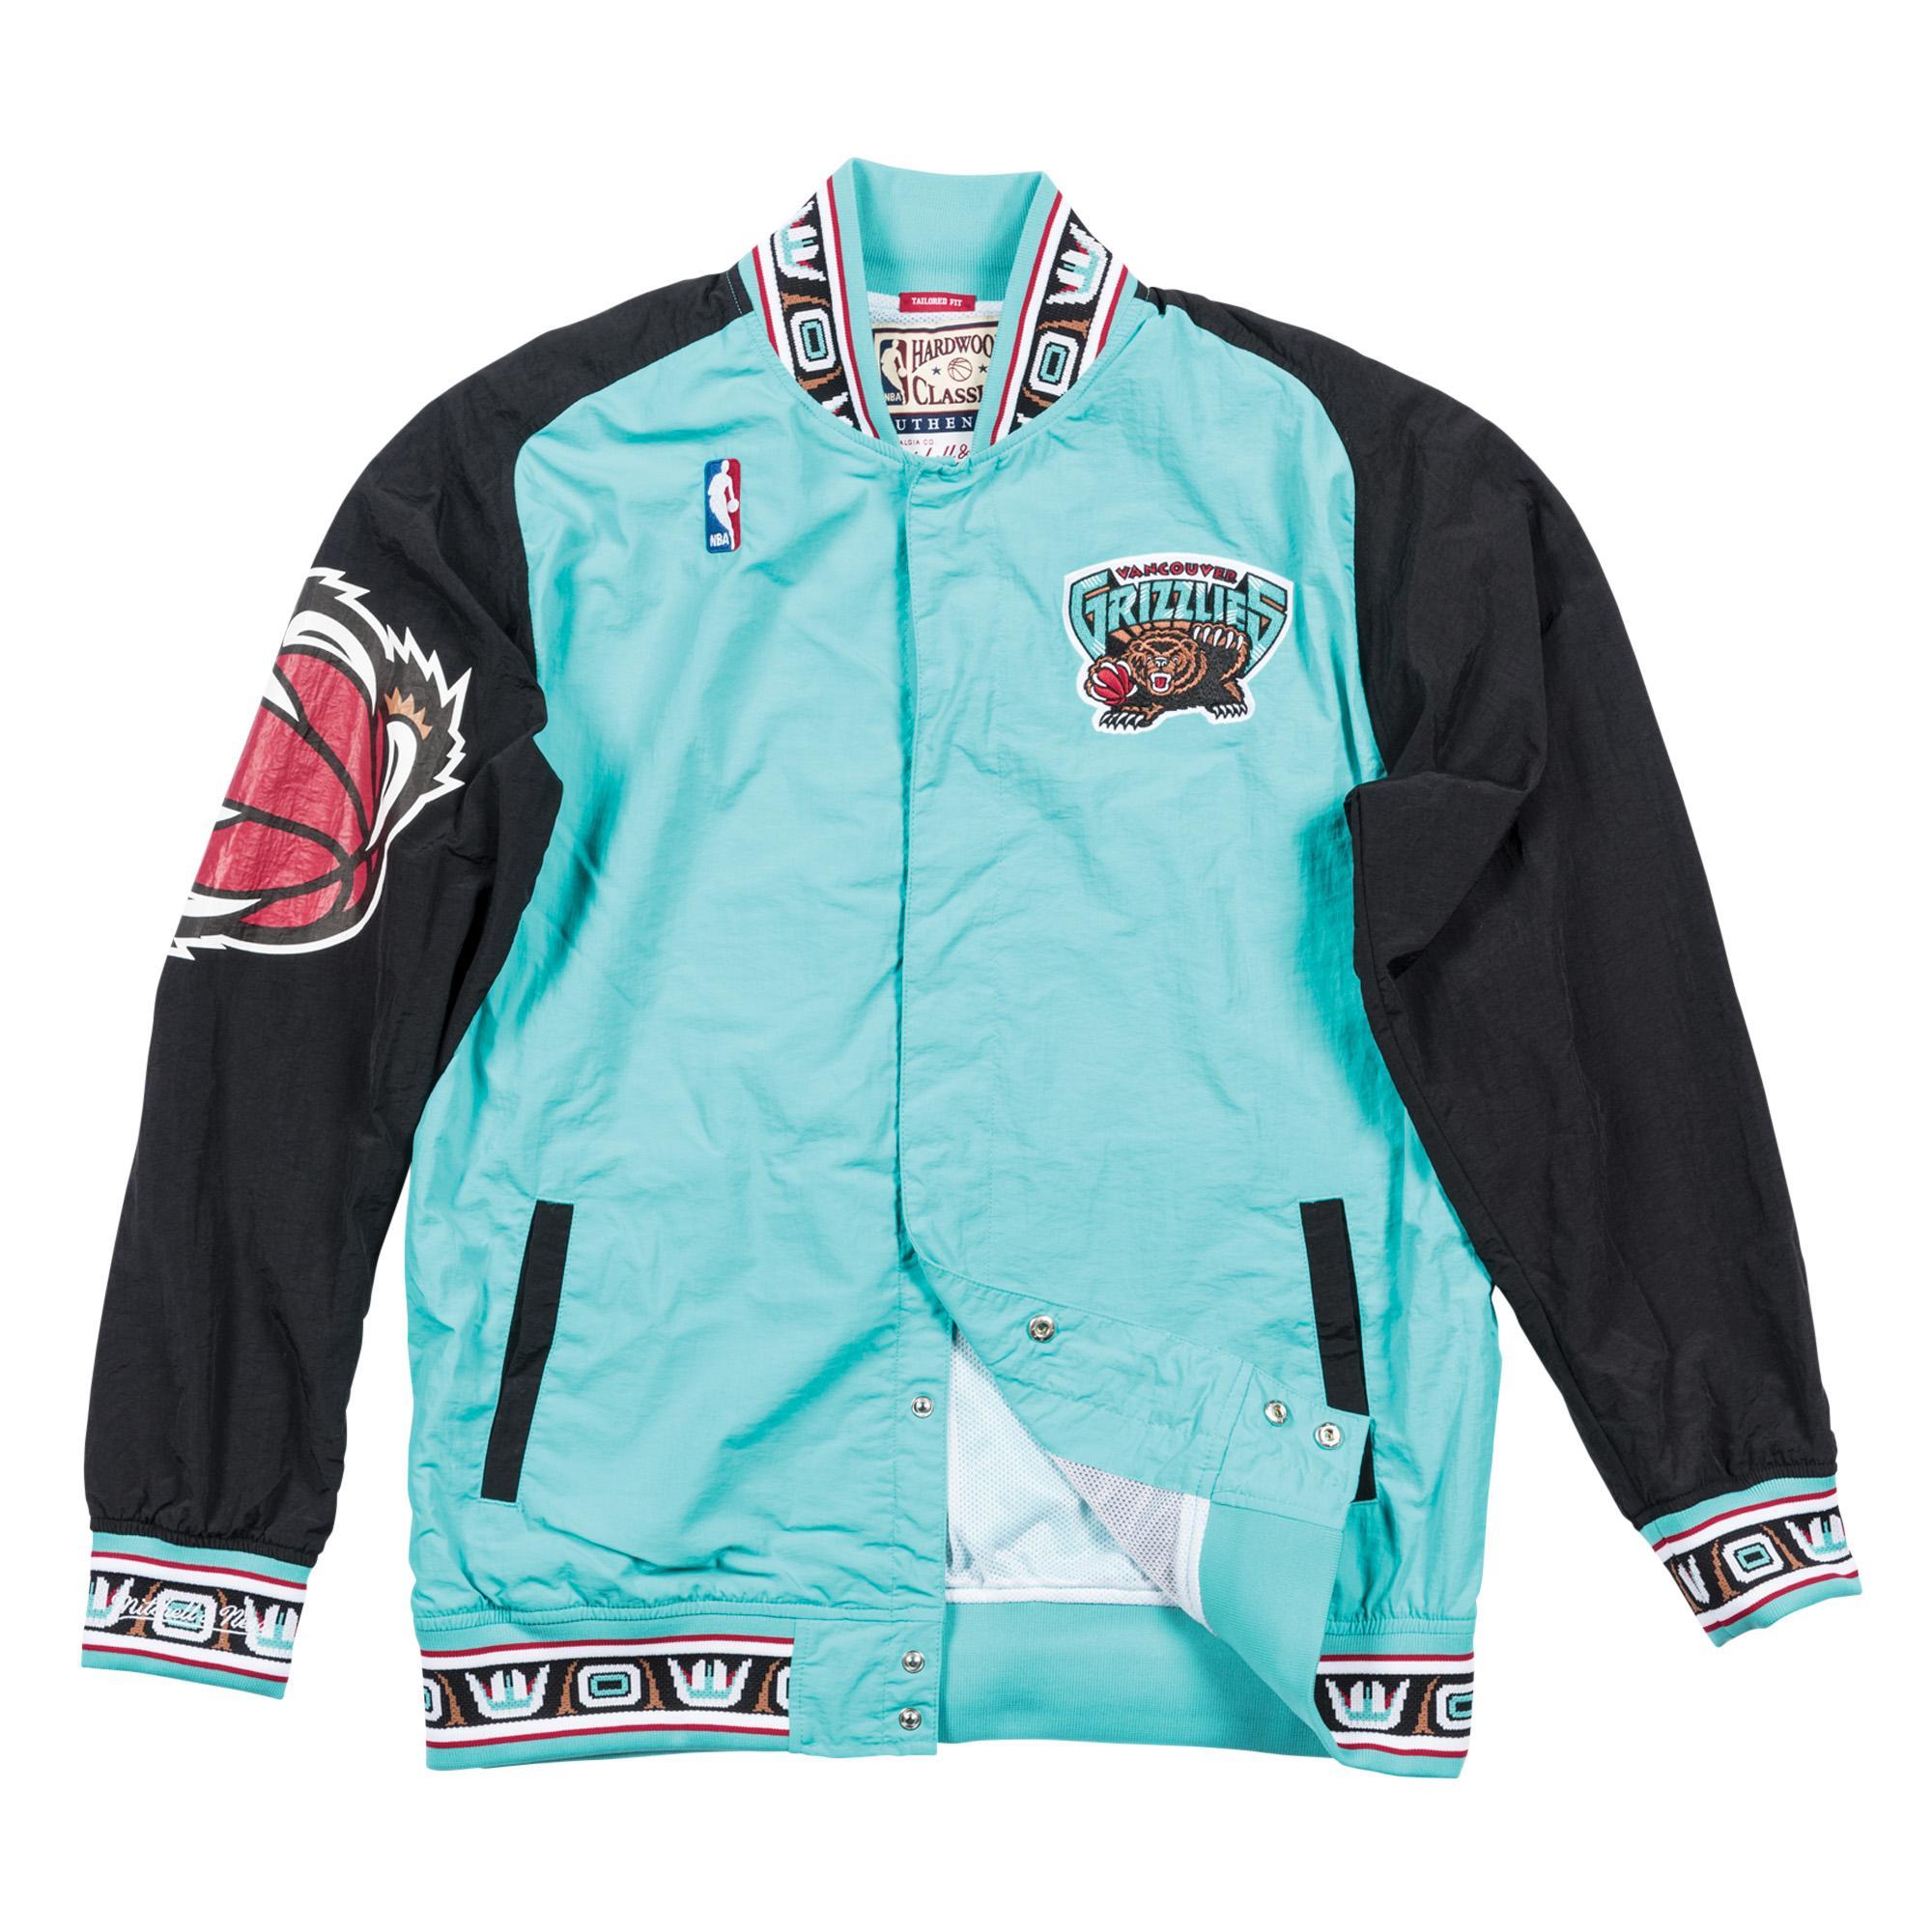 fc0f59c18cf 1995-96 Authentic Warm Up Jacket Vancouver Grizzlies